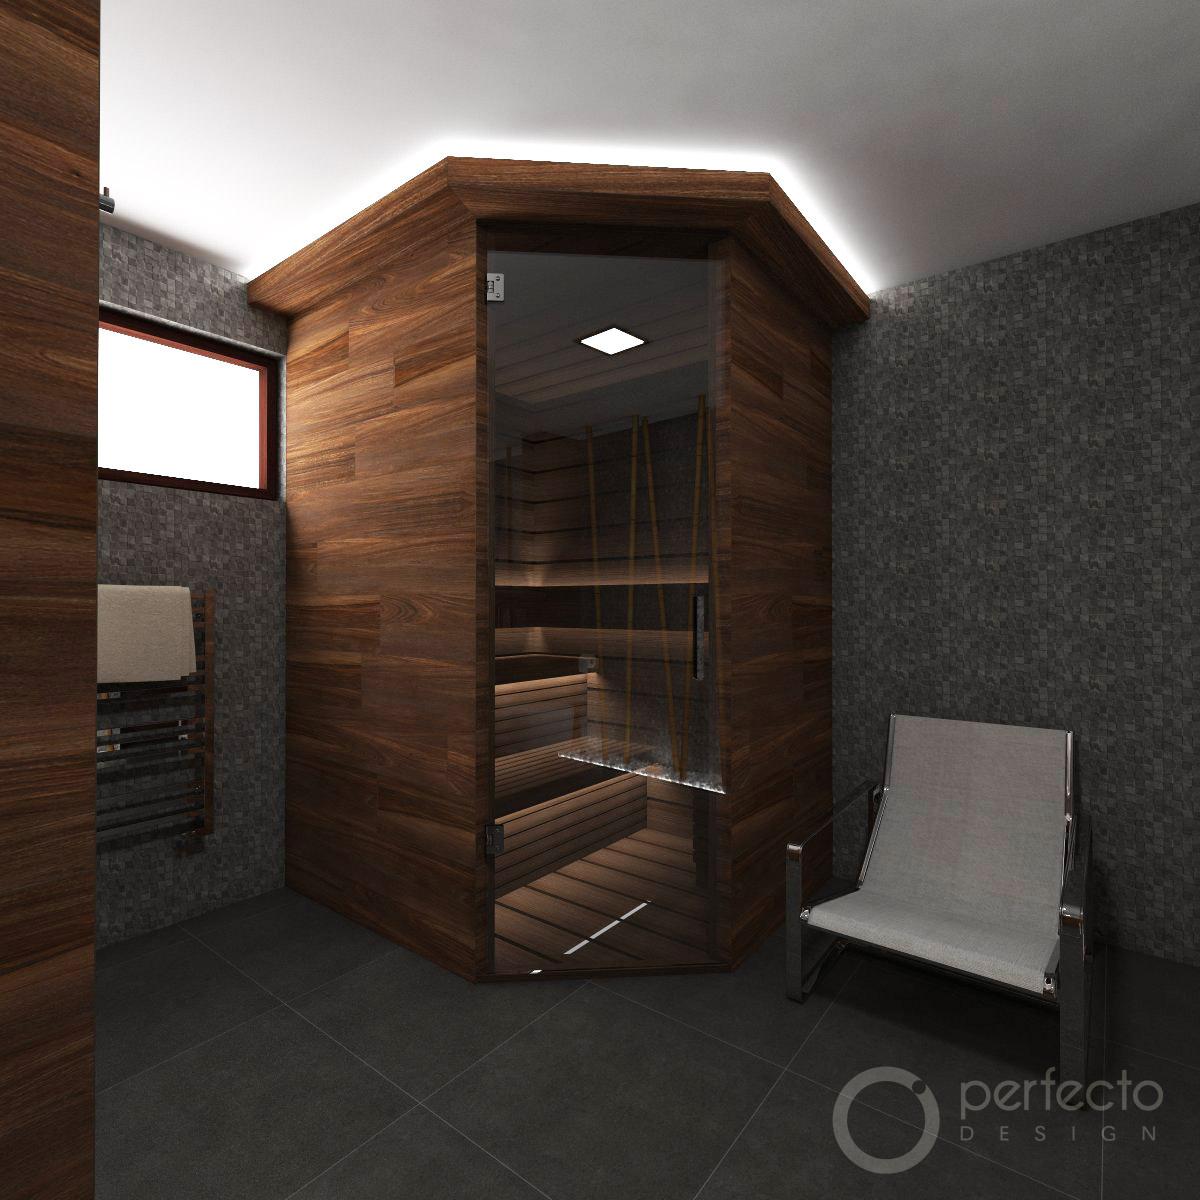 modernes wellness badezimmer zen | perfecto design, Badezimmer